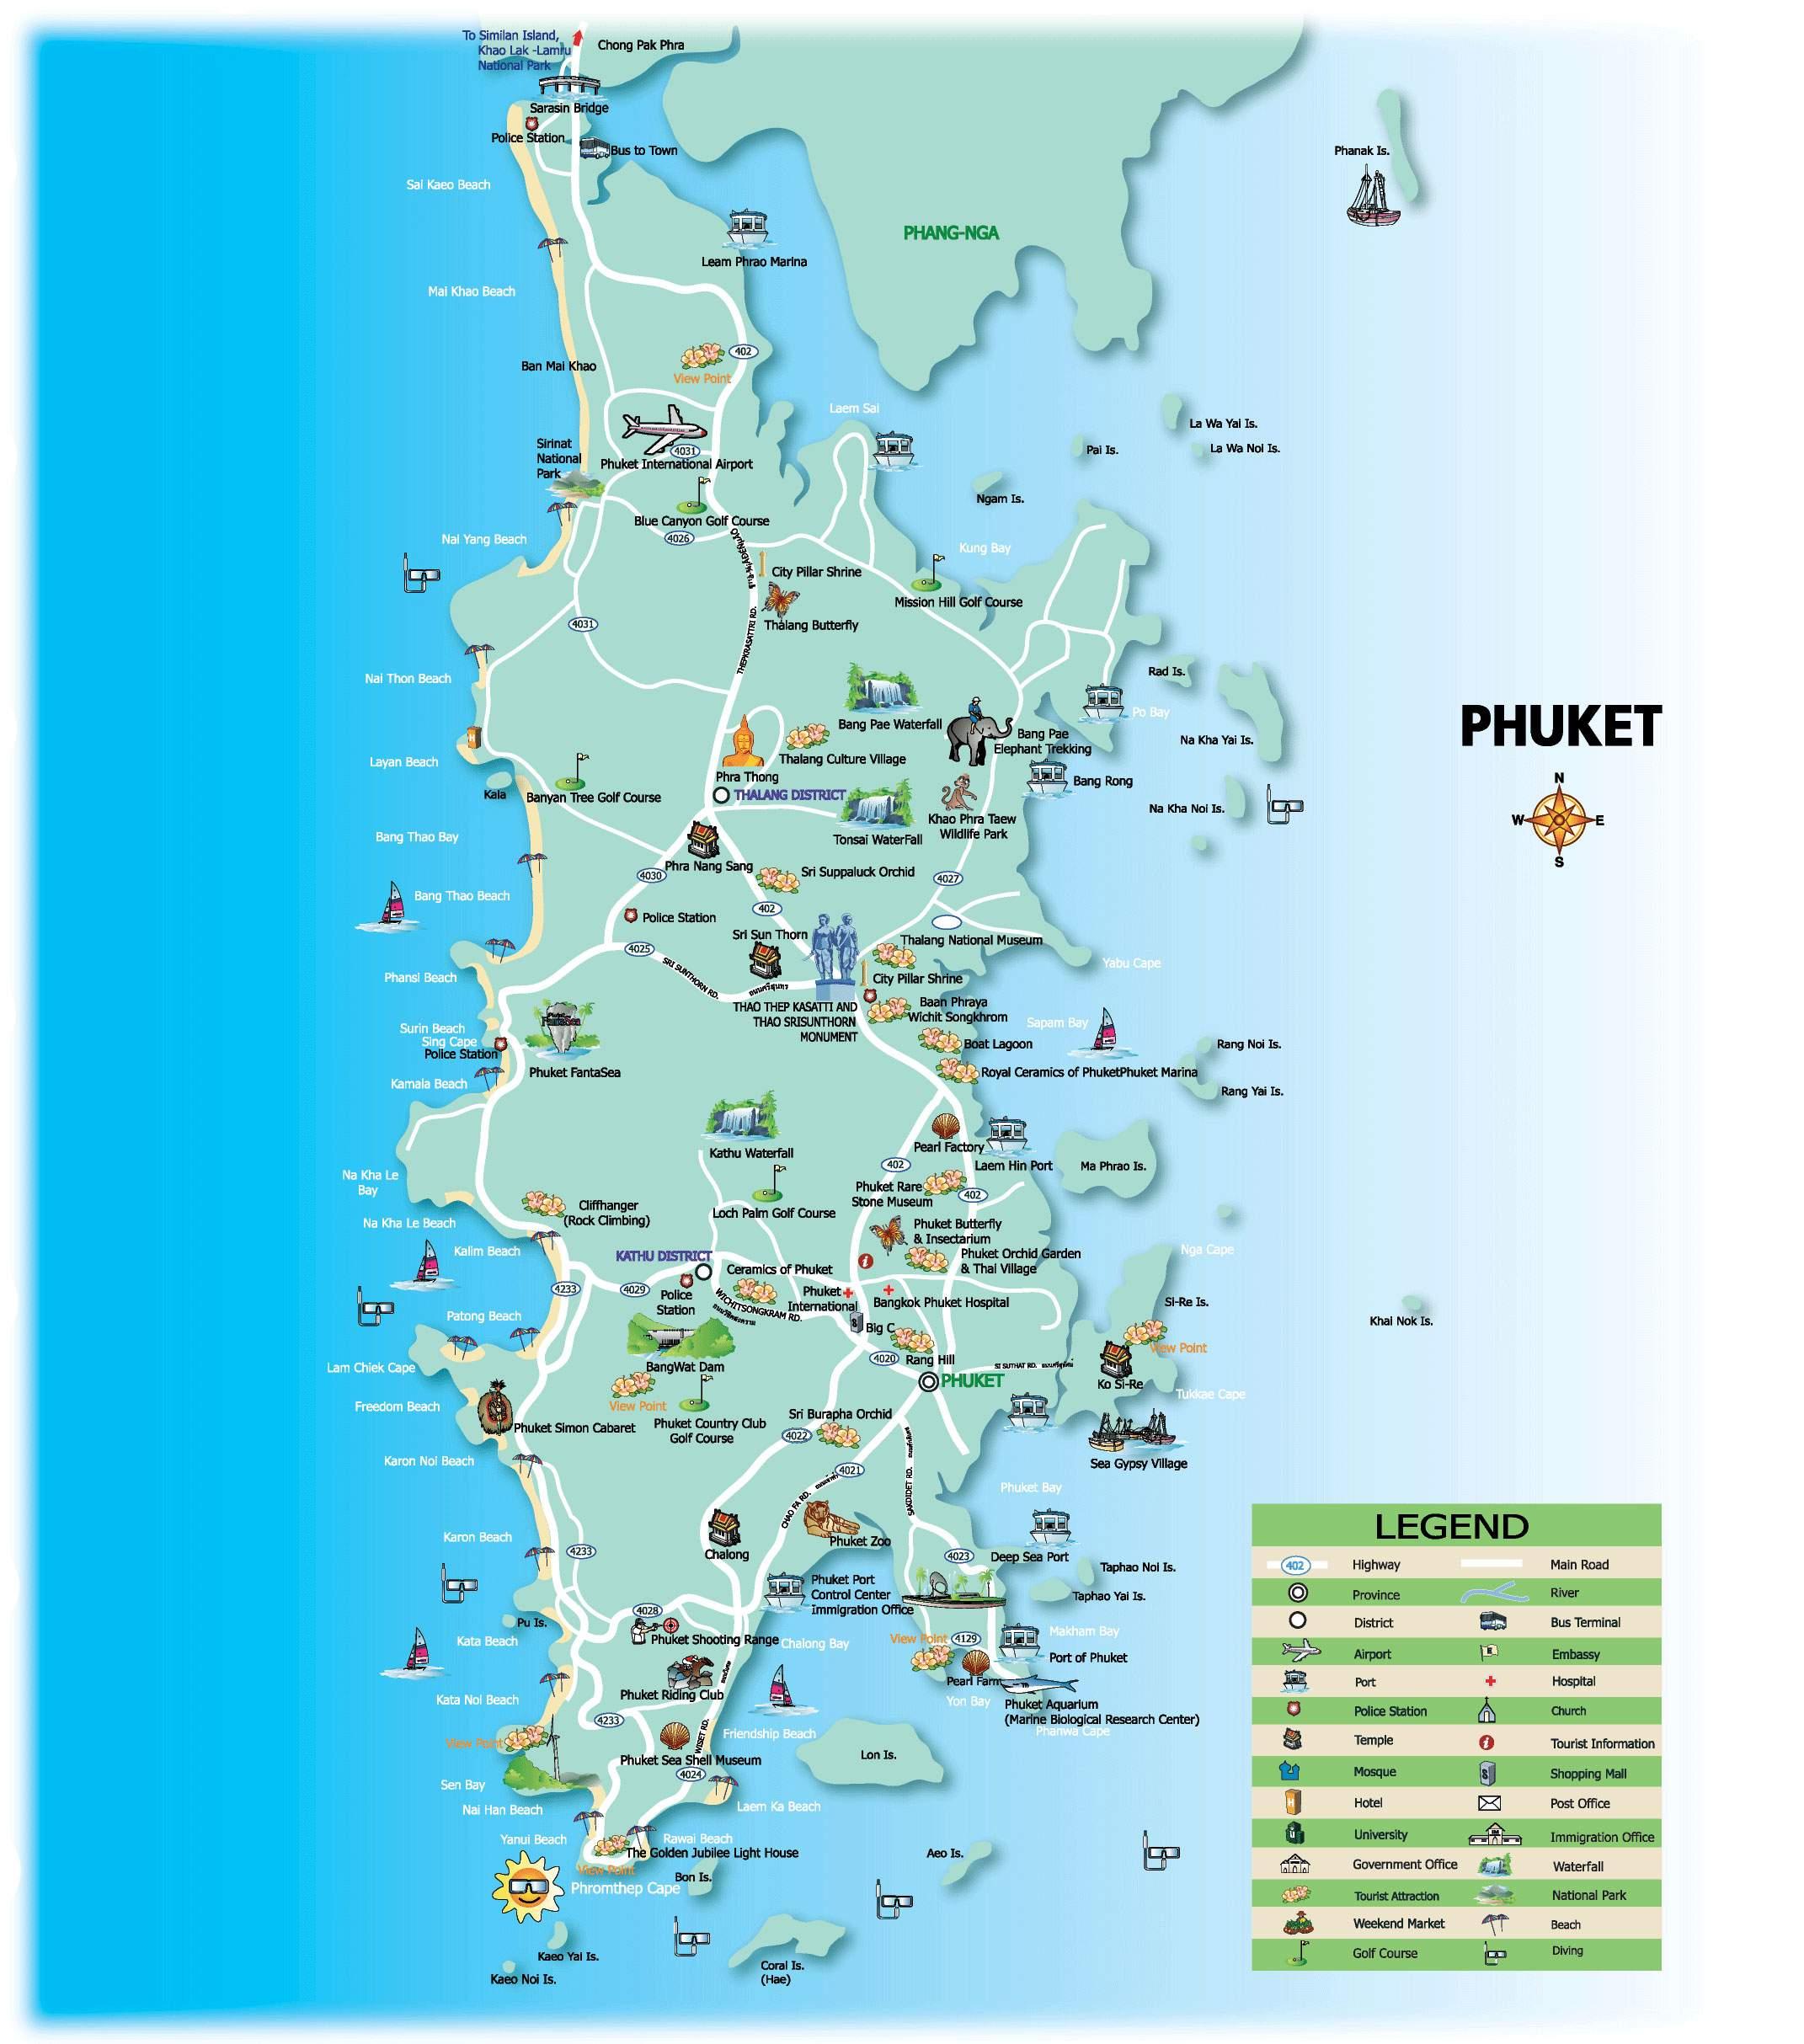 Map Of Phuket Large Phuket Maps for Free Download and Print | High Resolution  Map Of Phuket